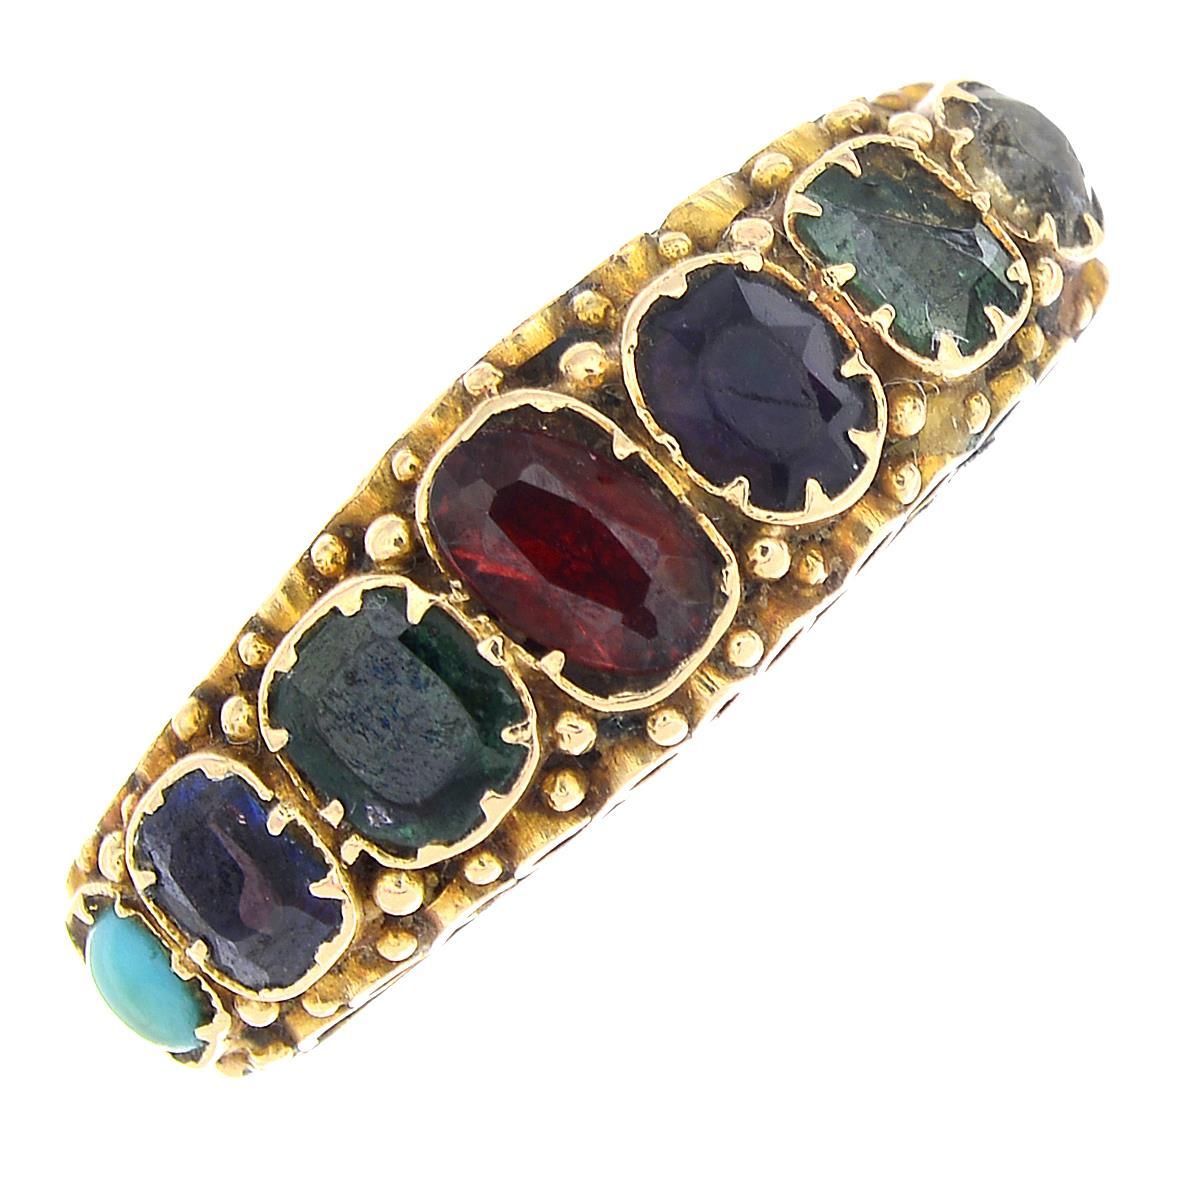 Lot 5 - A mid Victorian 15ct gold gem-set acrostic ring.Hallmarks for Birmingham, 1871.